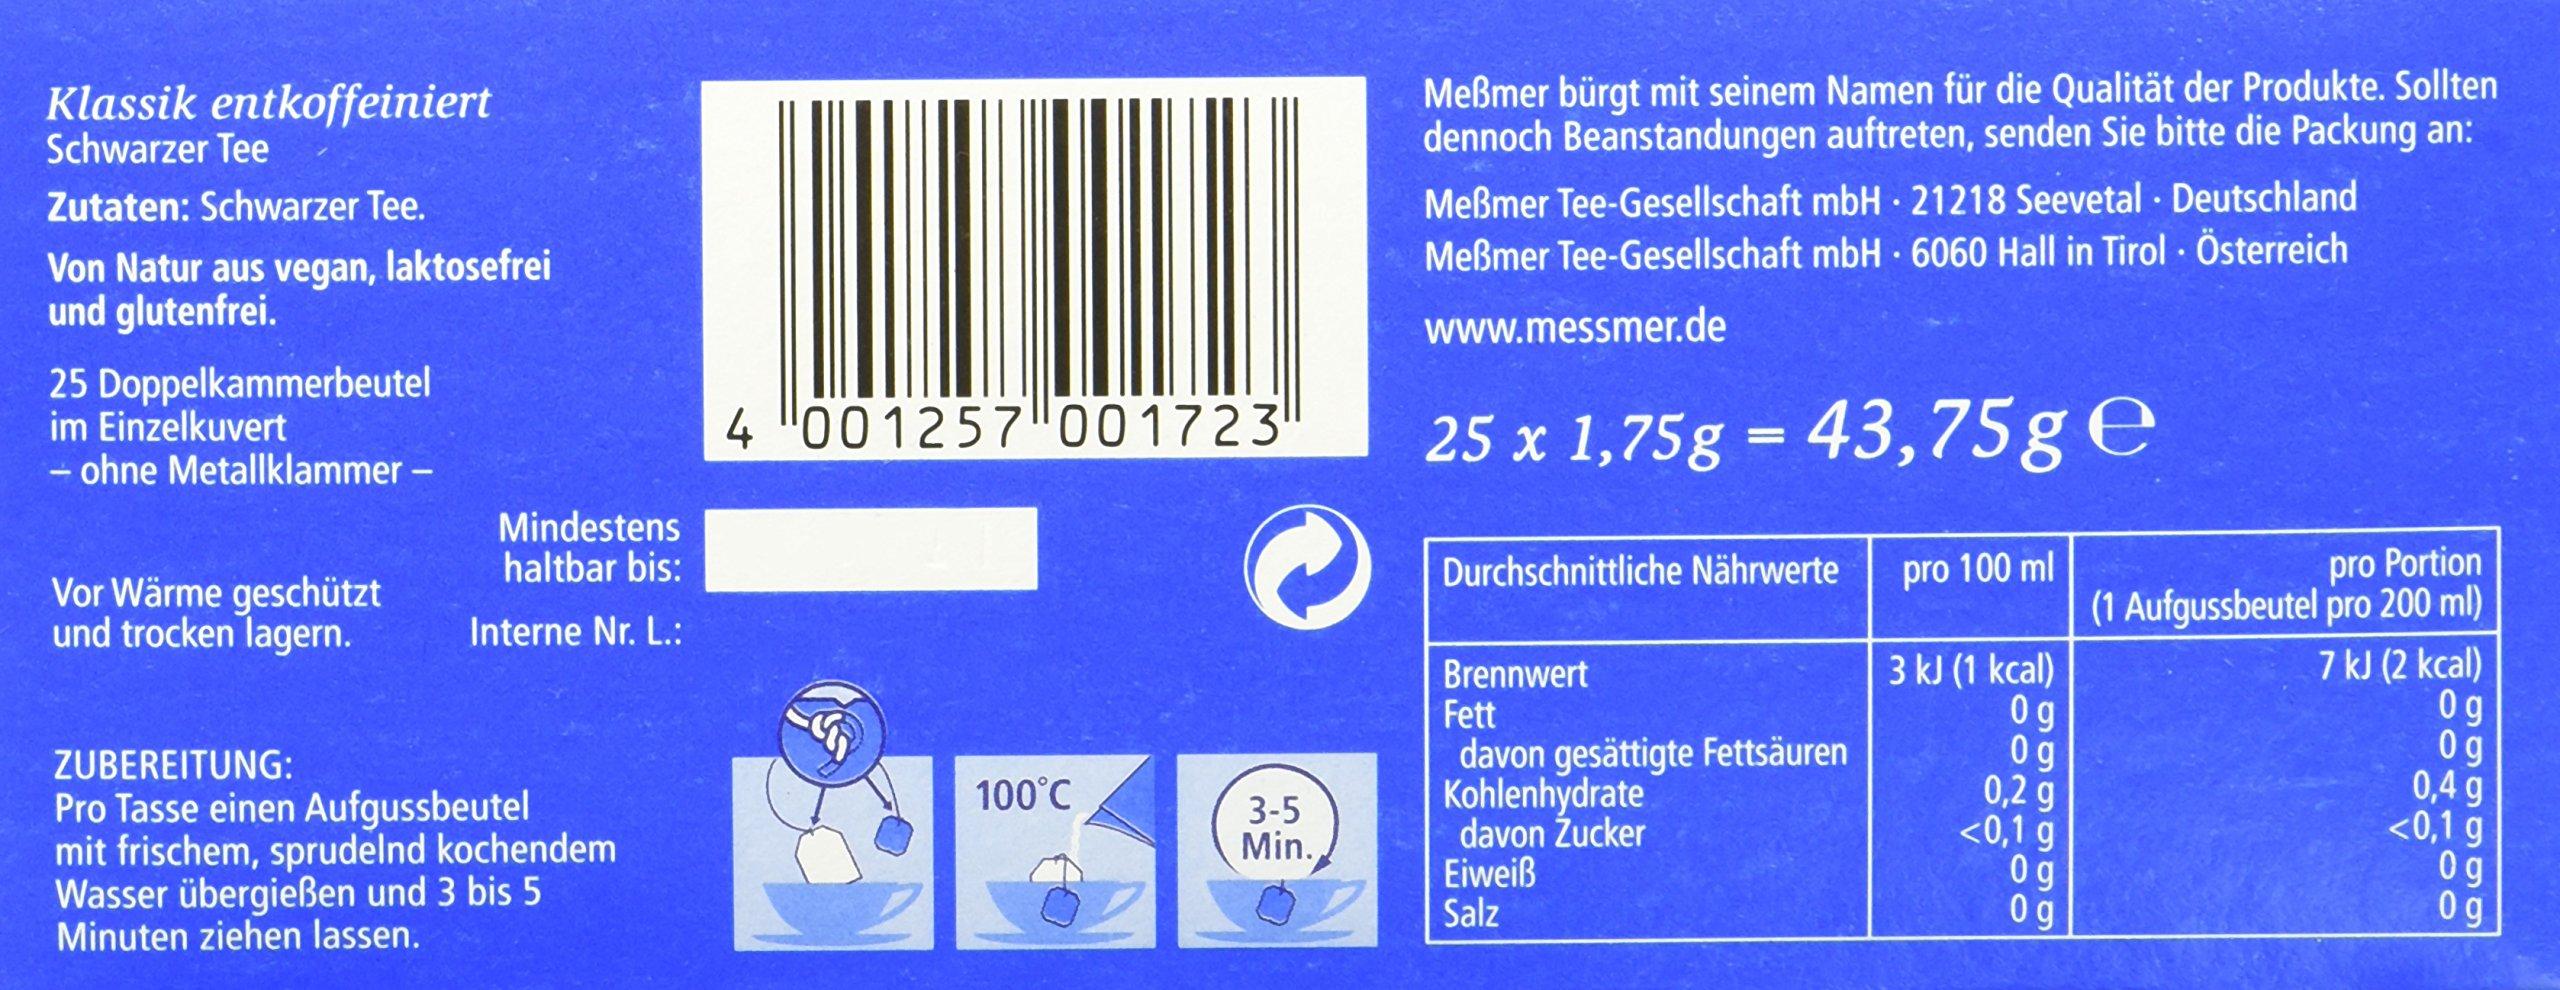 Memer-Klassik-entcoffeiniert-25-TB